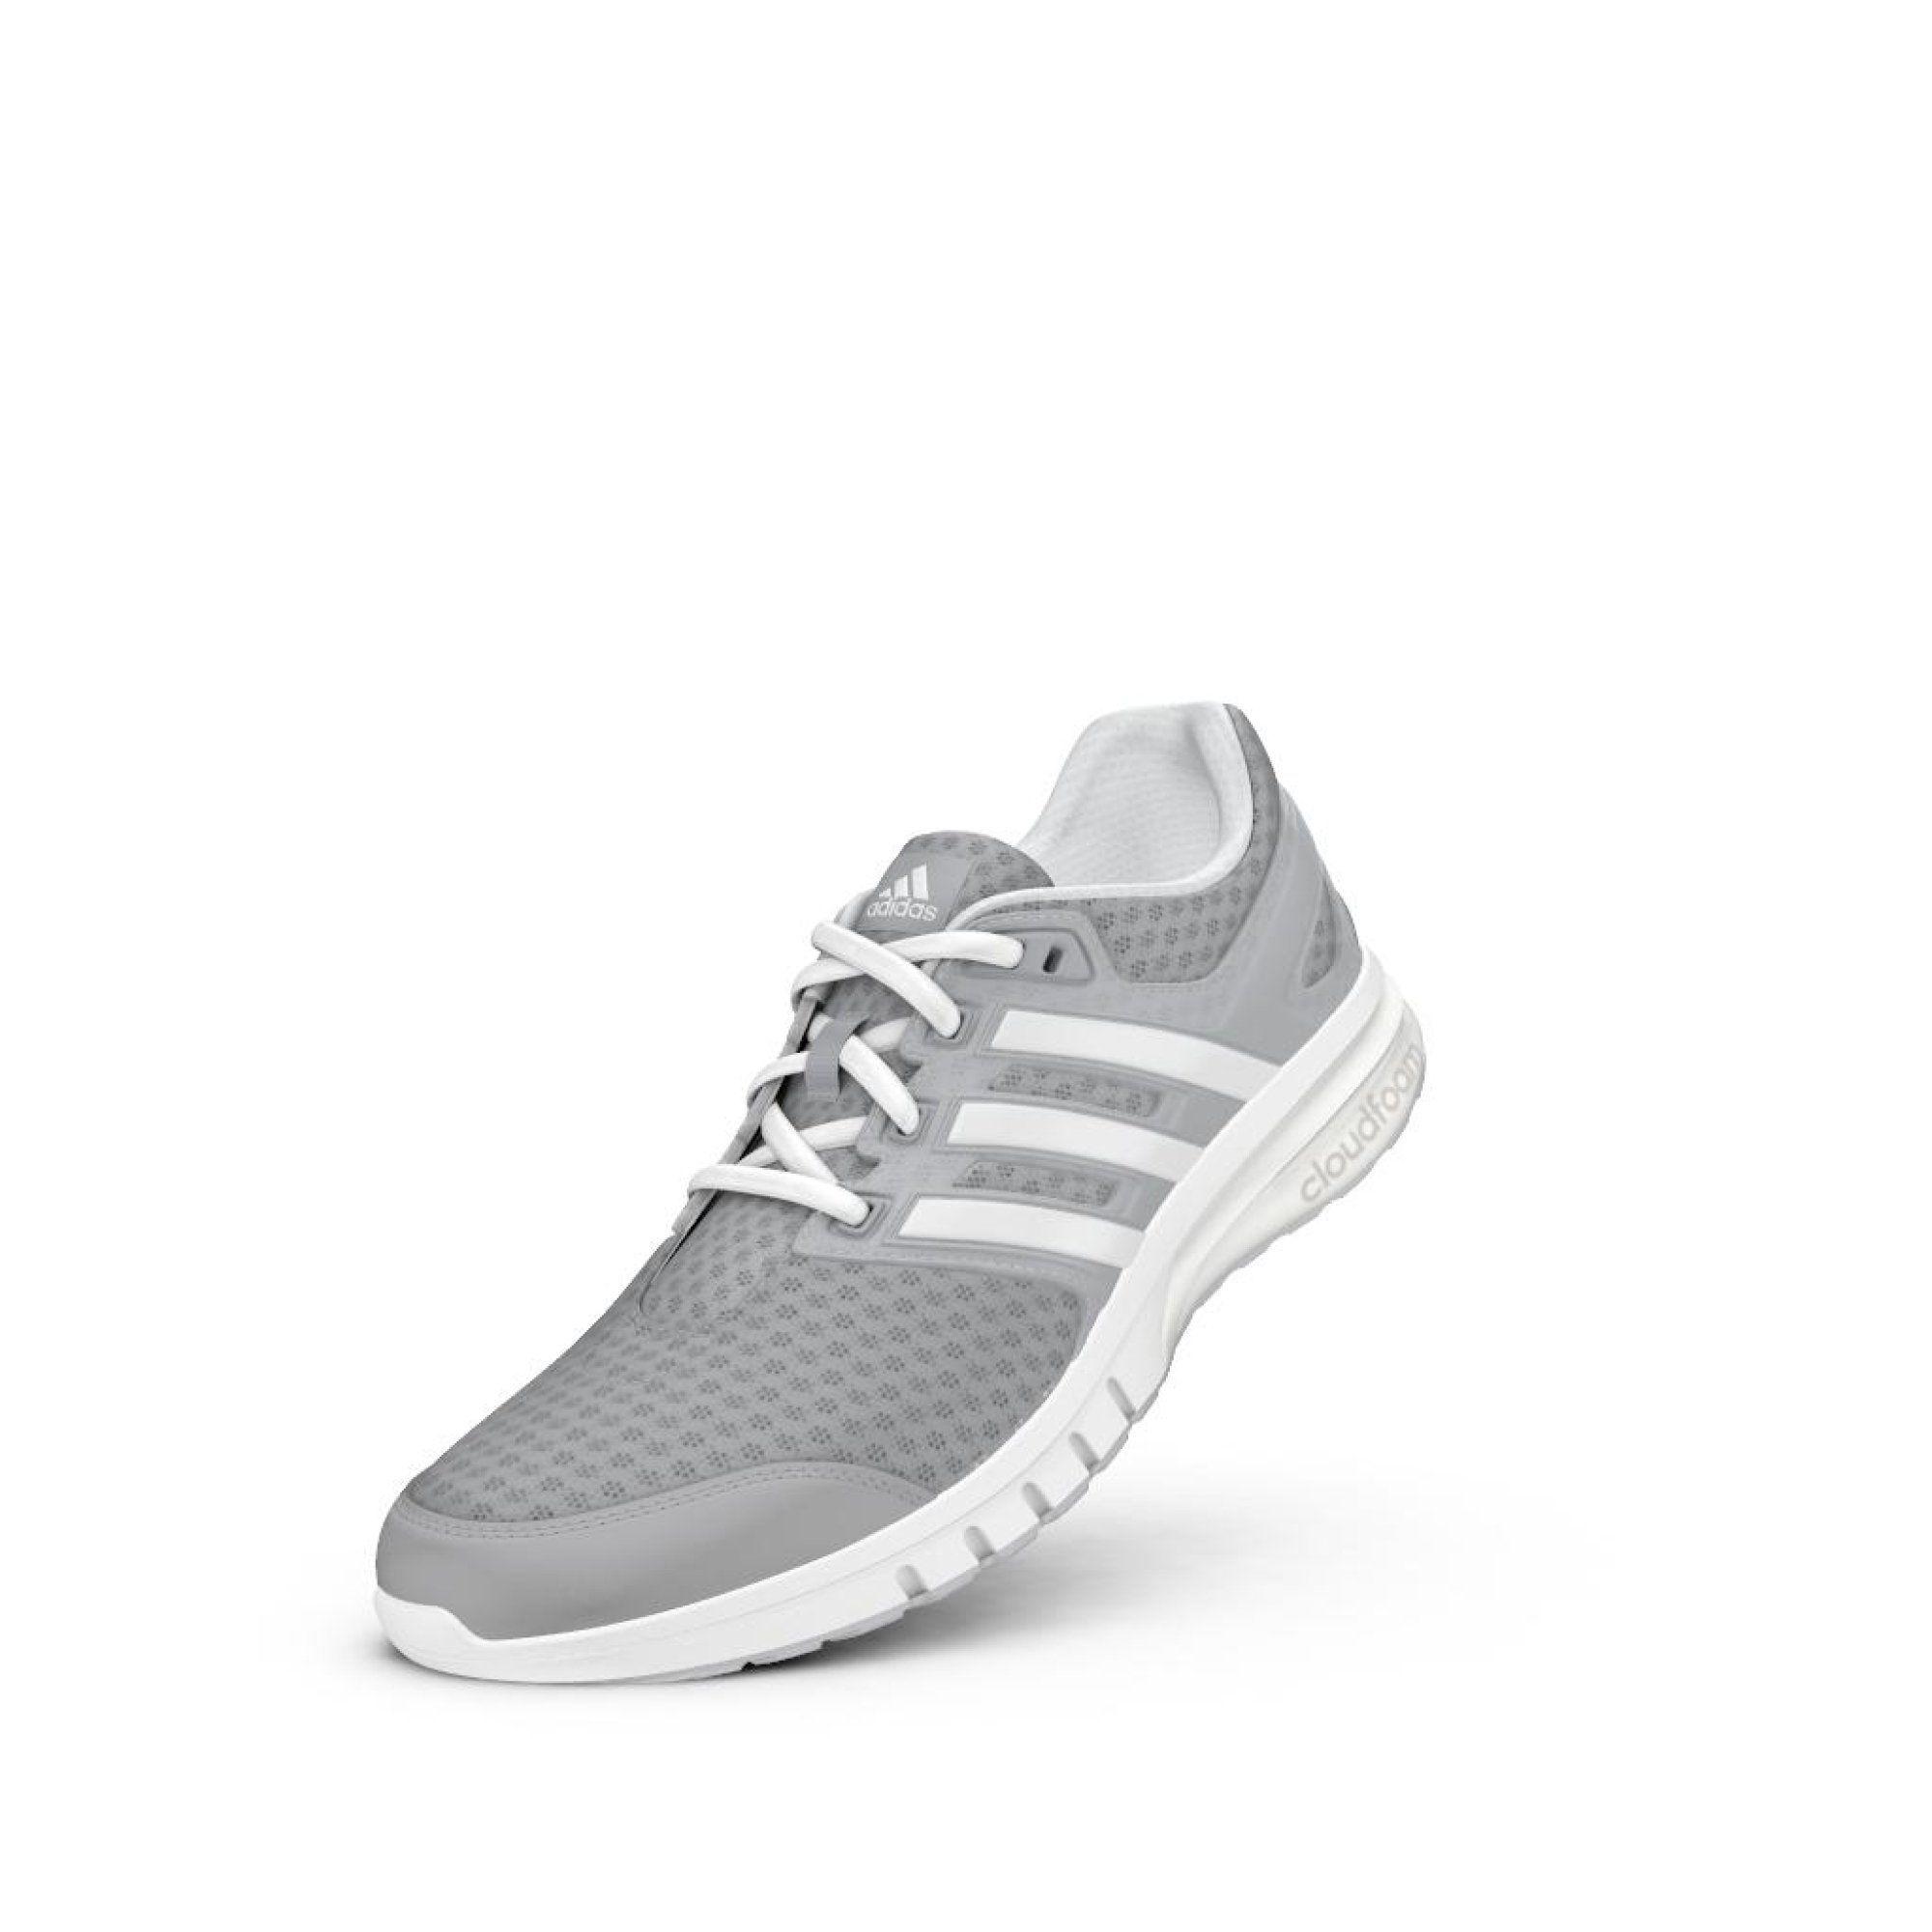 the best attitude 8528c 38e5d adidas Performance Womens Galaxy 2 Elite w Running Shoe, Clear  OnixWhiteBlack